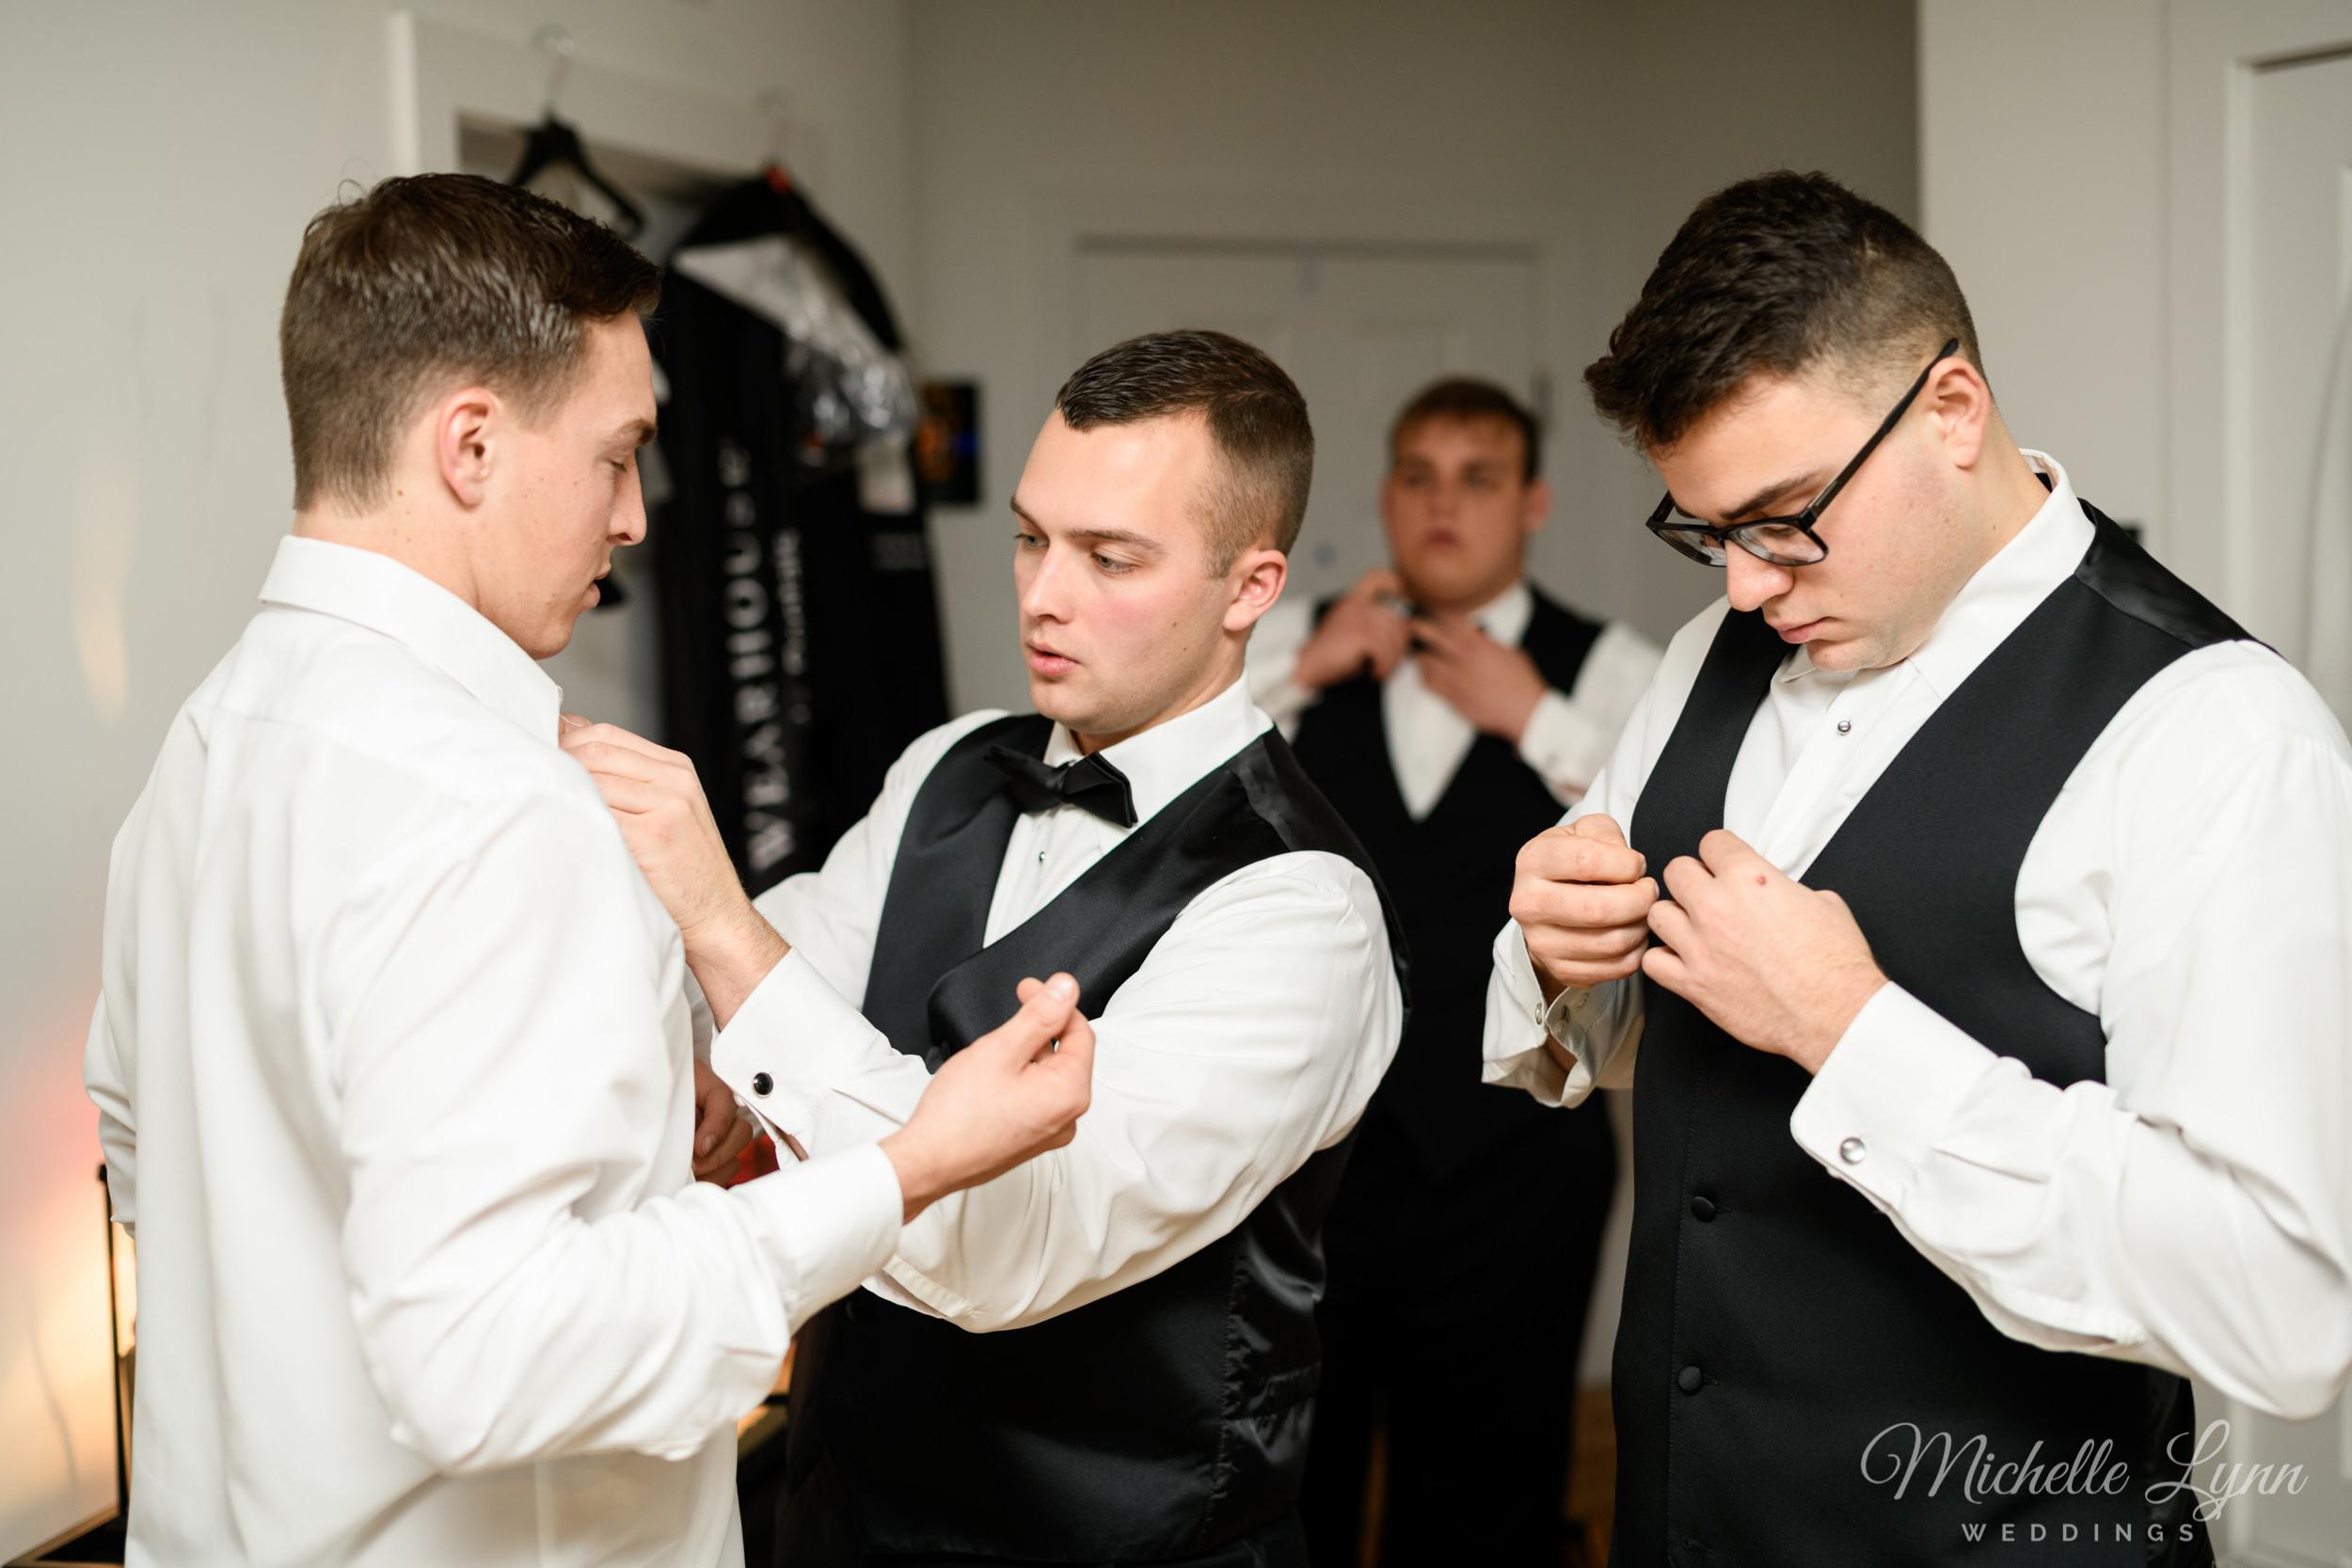 william-penn-inn-wedding-photography-mlw-35.jpg